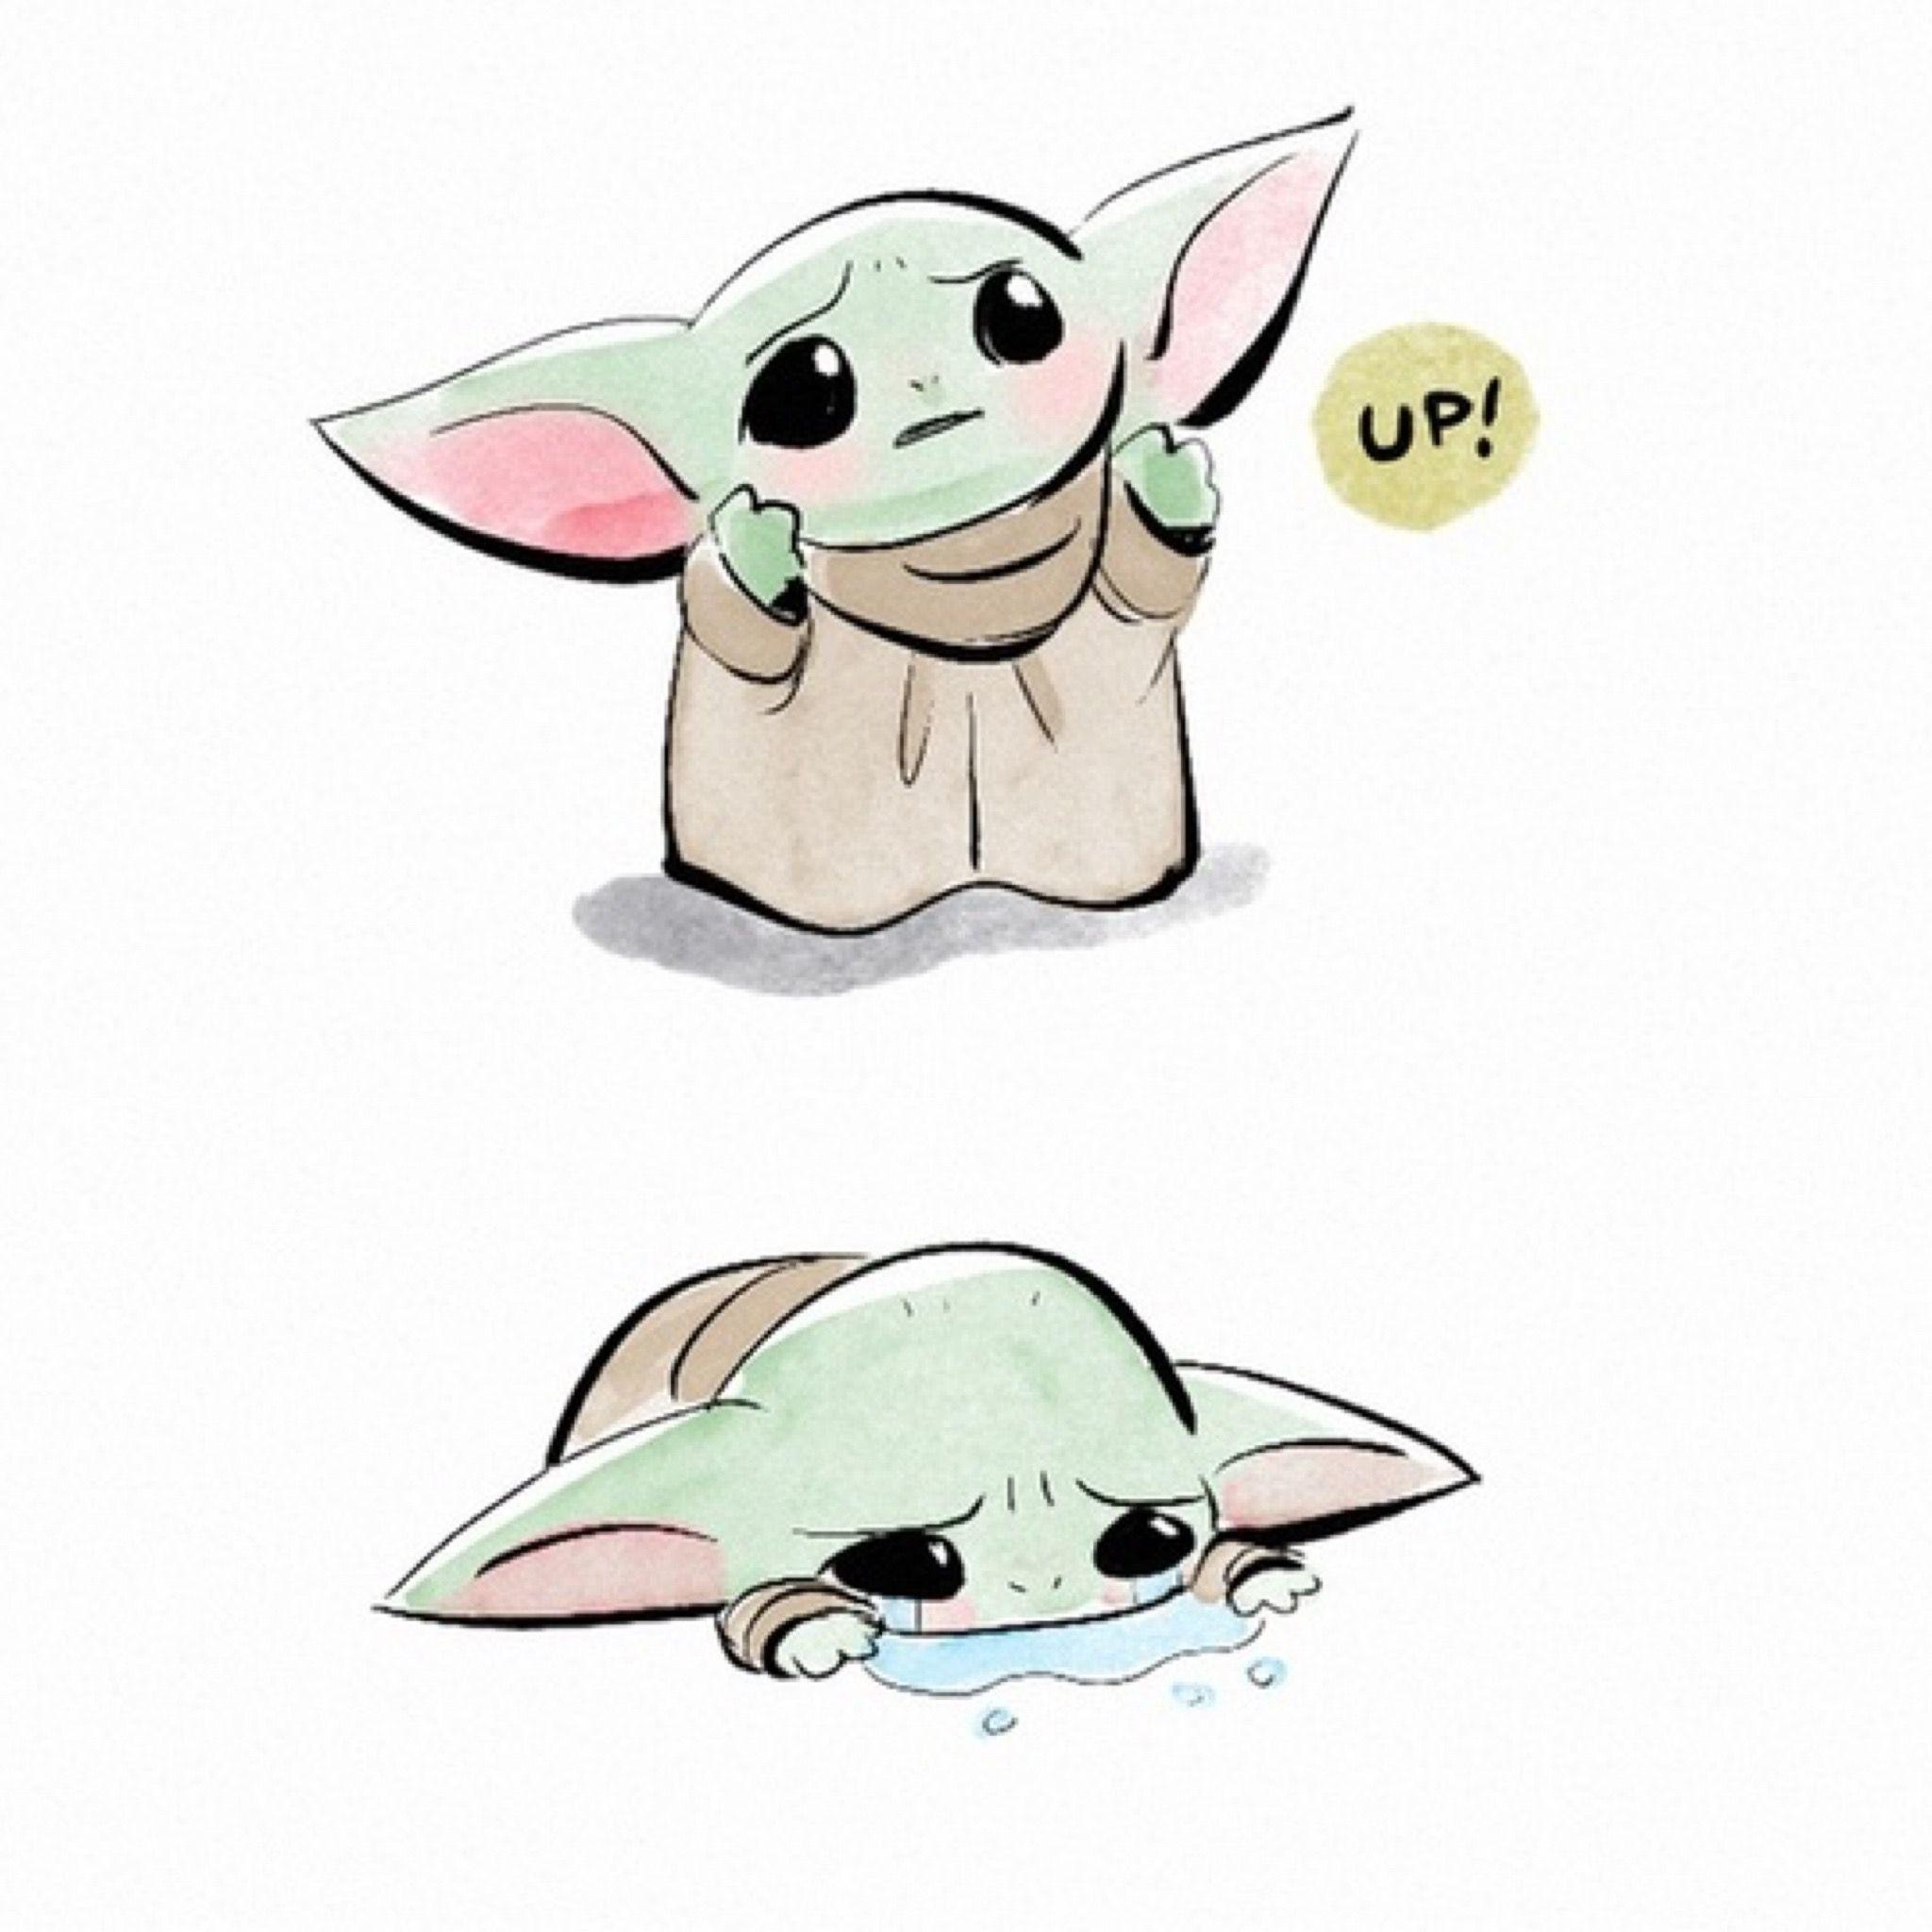 Baby Yoda Cute Cartoon Drawings Star Wars Baby Yoda Drawing